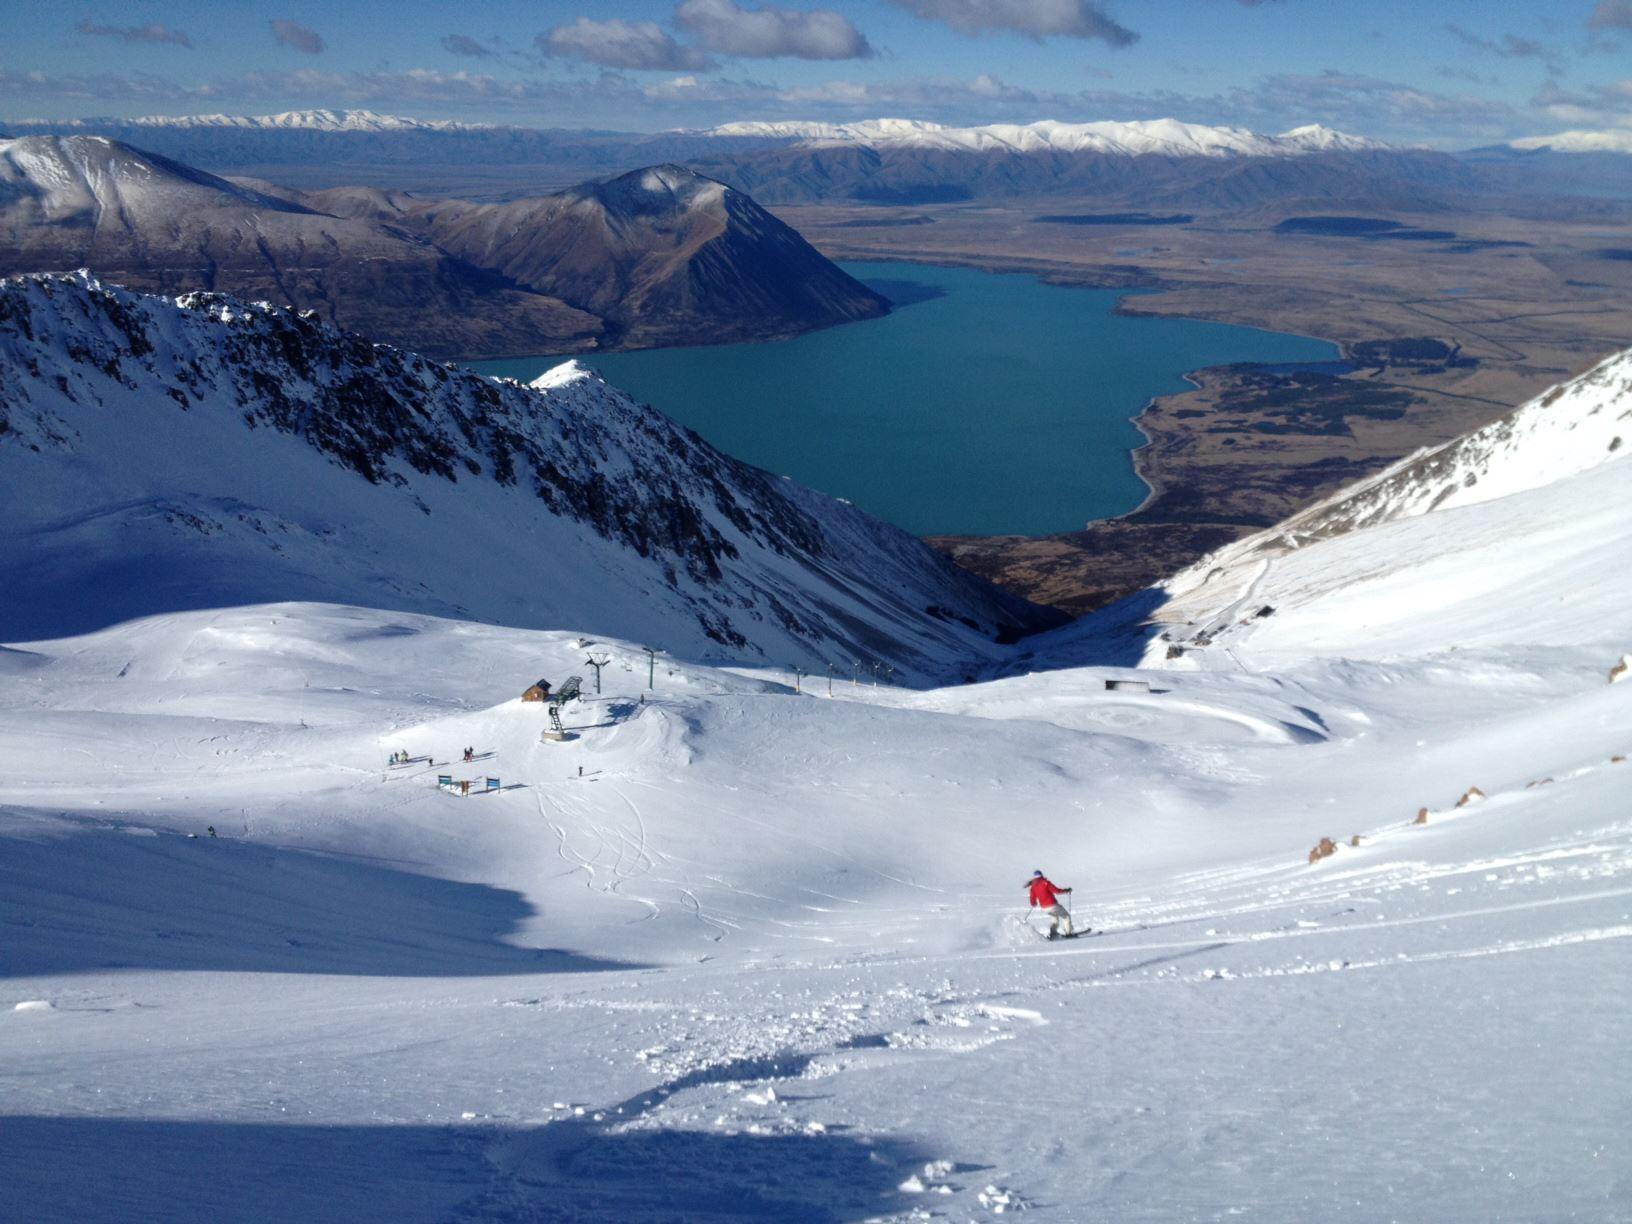 Nueva Zelanda, Isla del Sur, South Island, Ohau Snow Fields